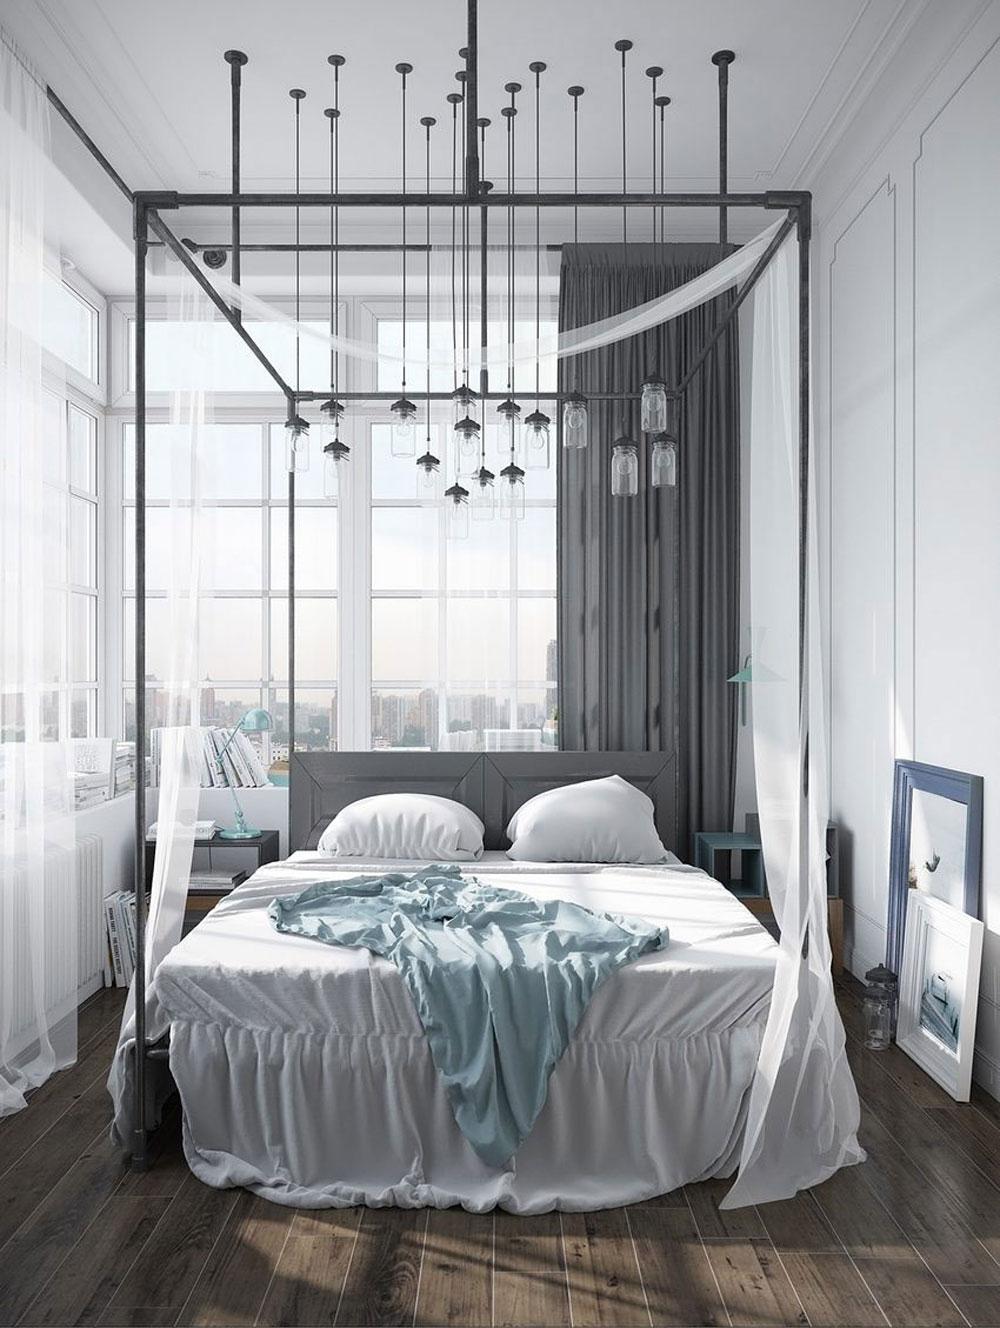 Special-Bedroom-Interior-Inspiration-For-A-Cozy-Home-10 Special Bedroom Interior Inspiration for a cozy home